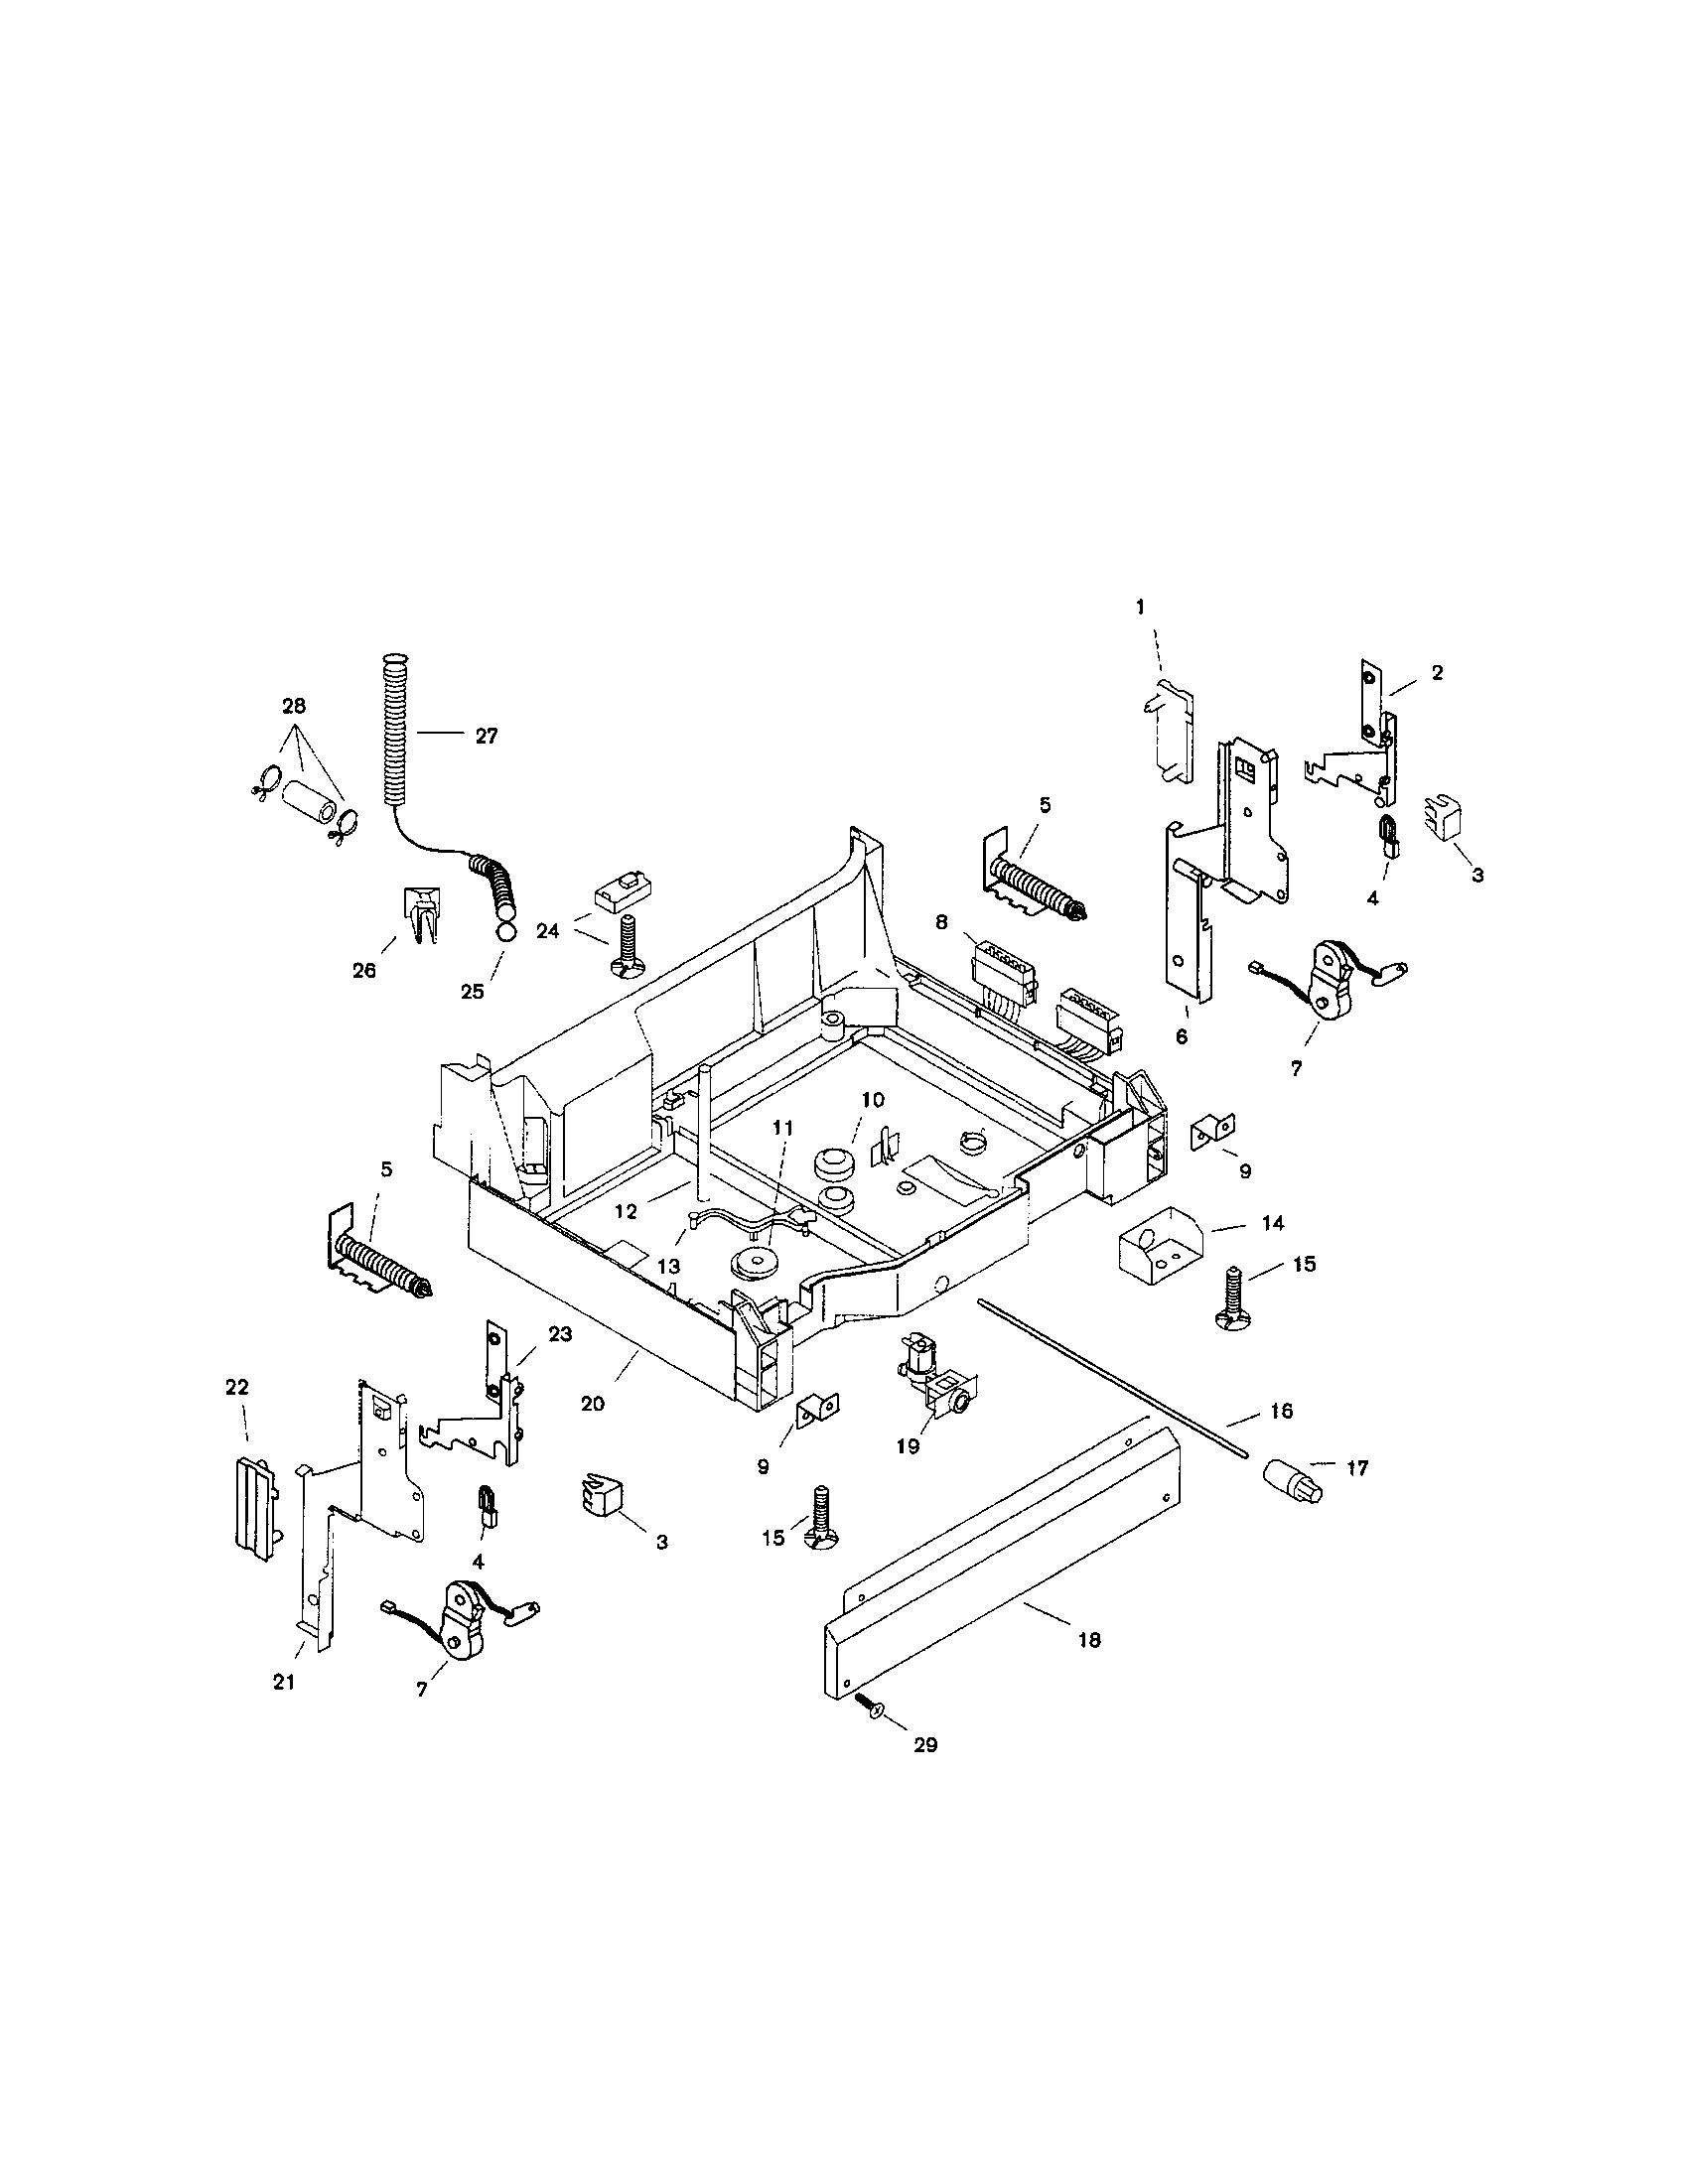 Bosch model SHU9915UC/11 dishwasher genuine parts